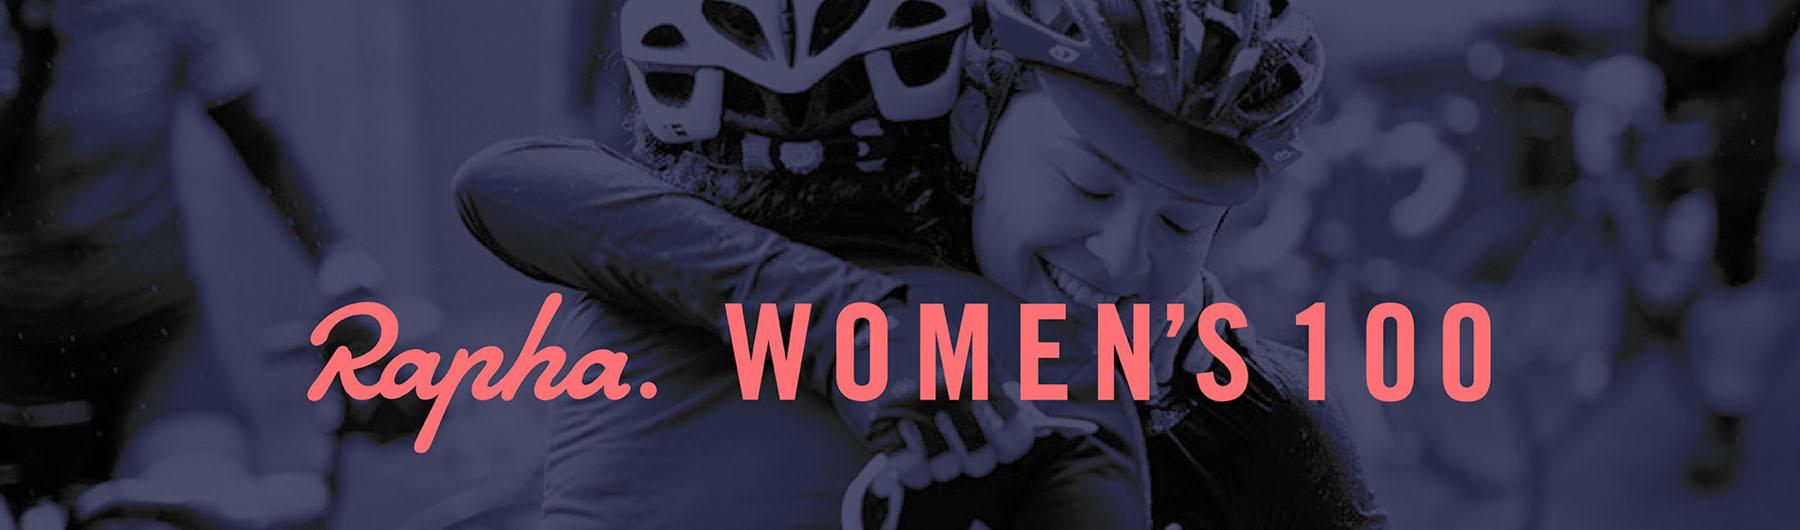 Women's 100 Geneva / Jura